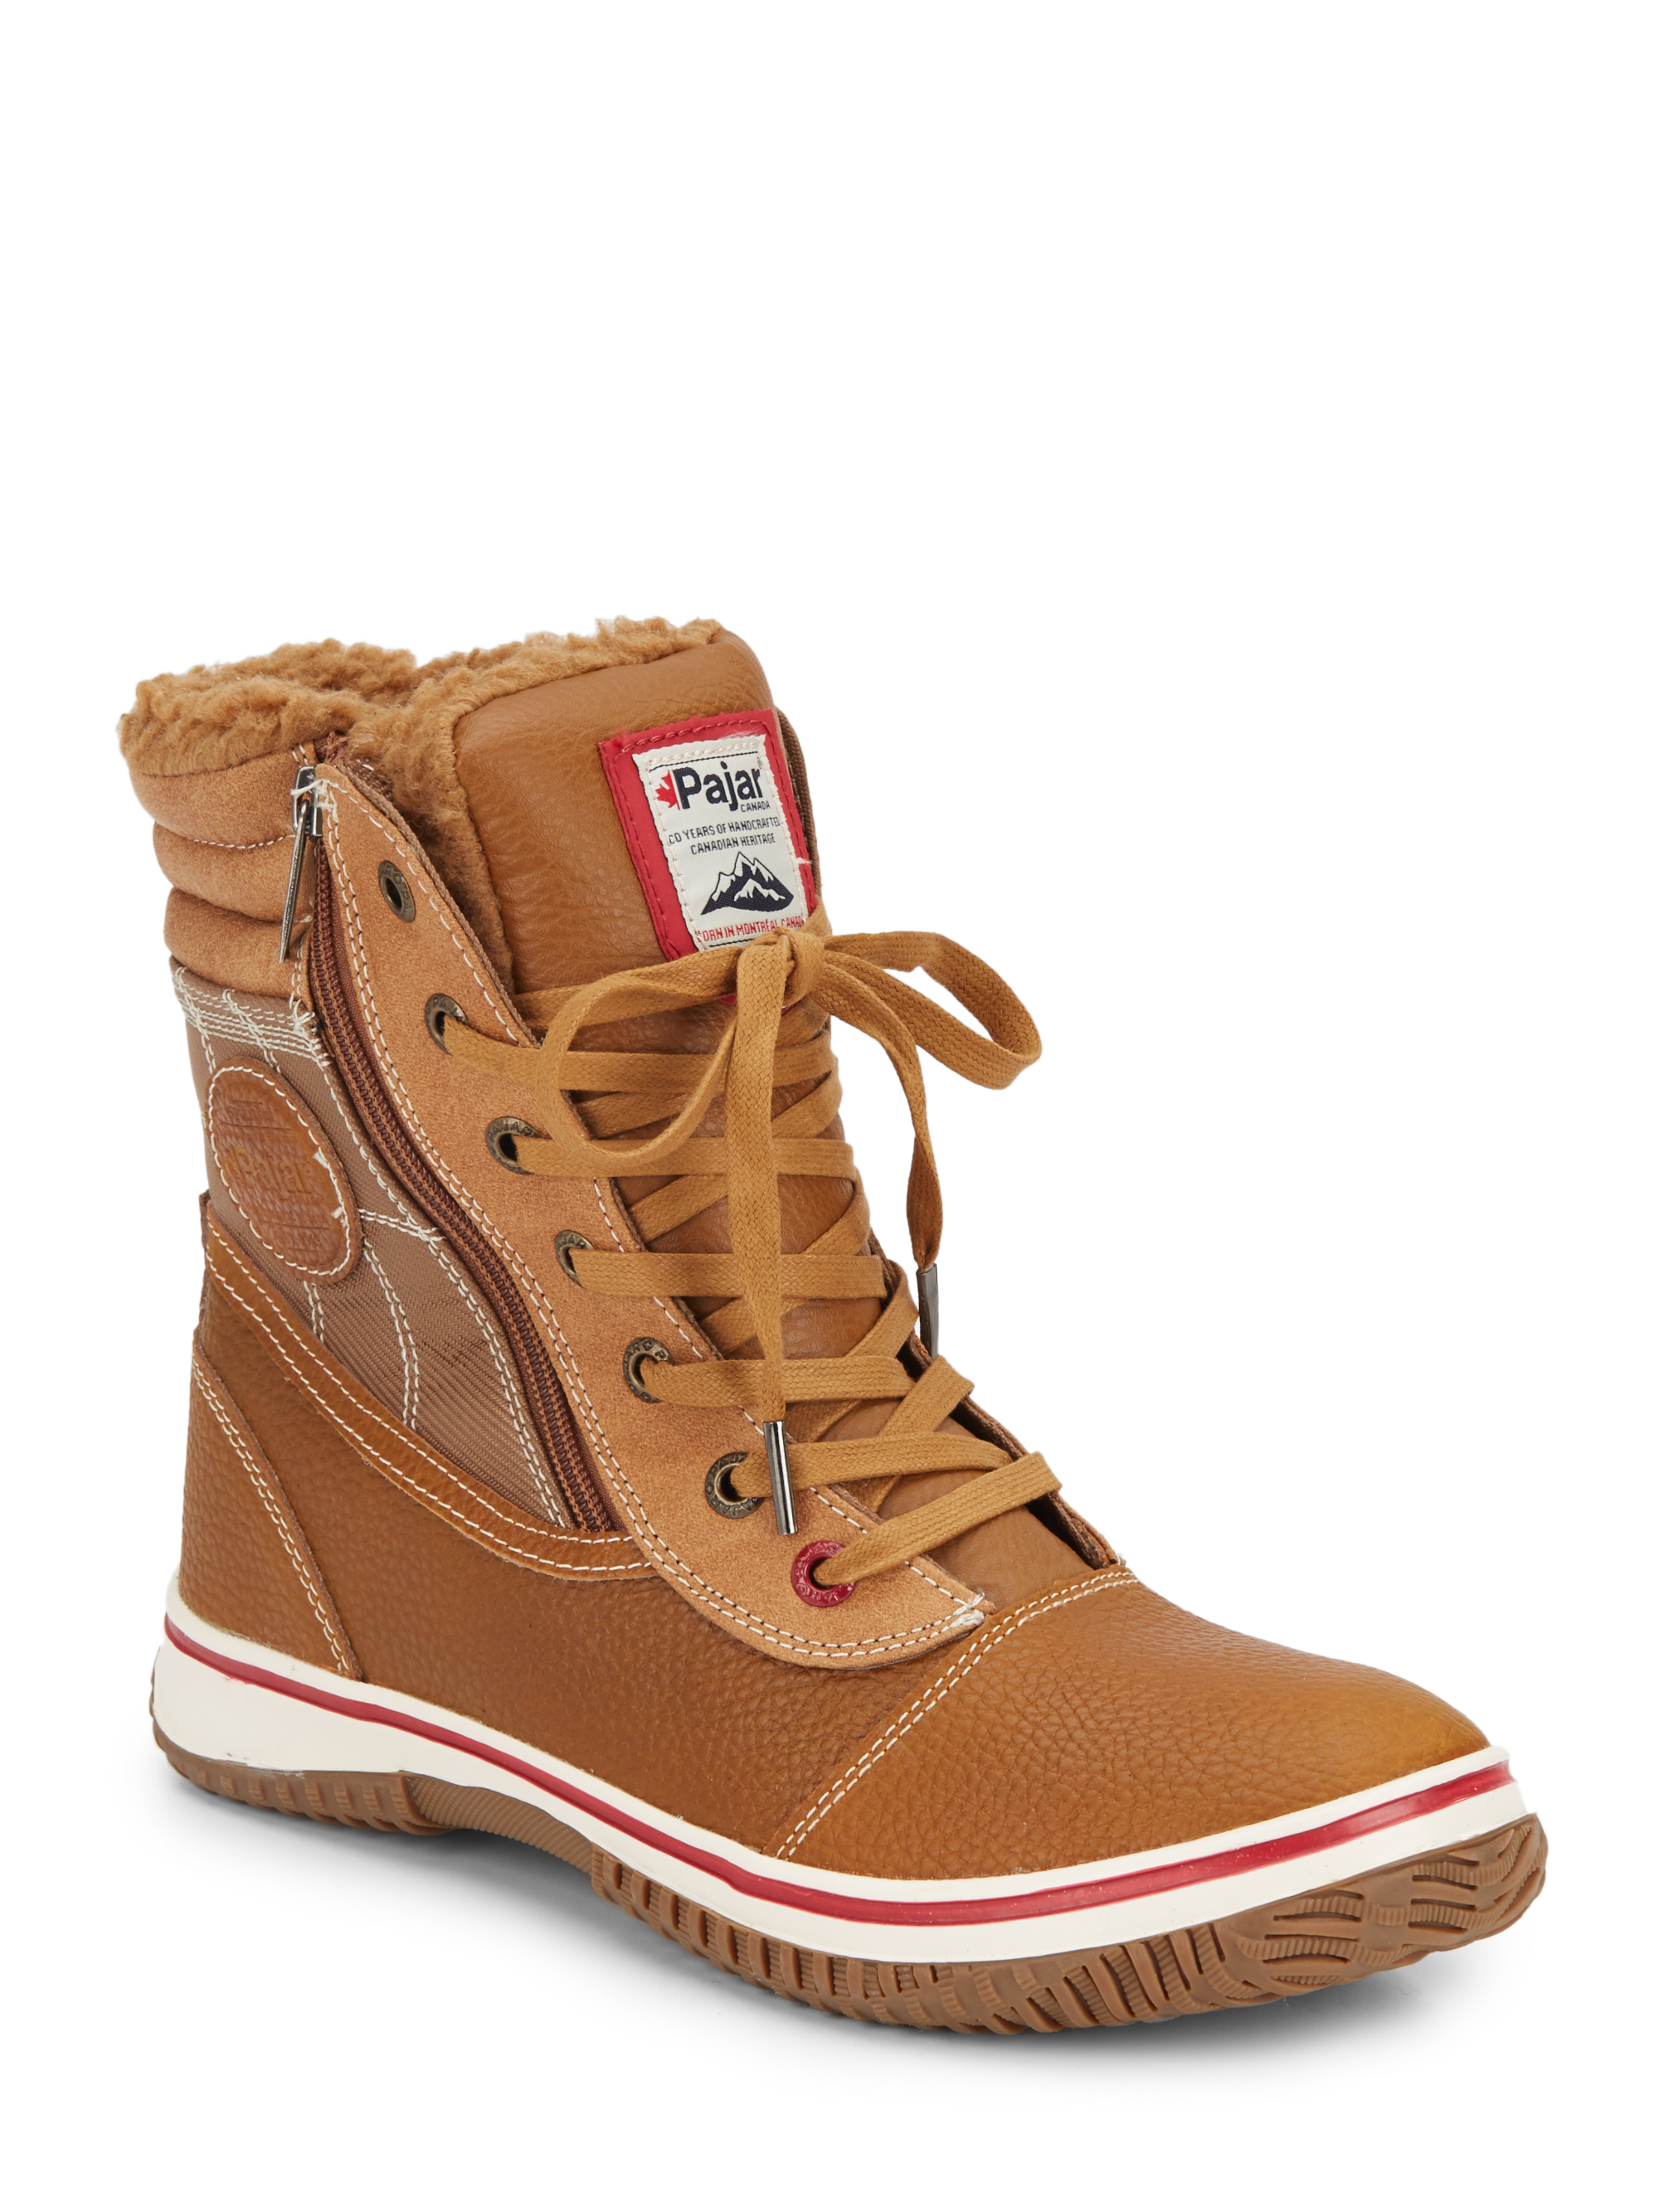 Shoes-030.JPG